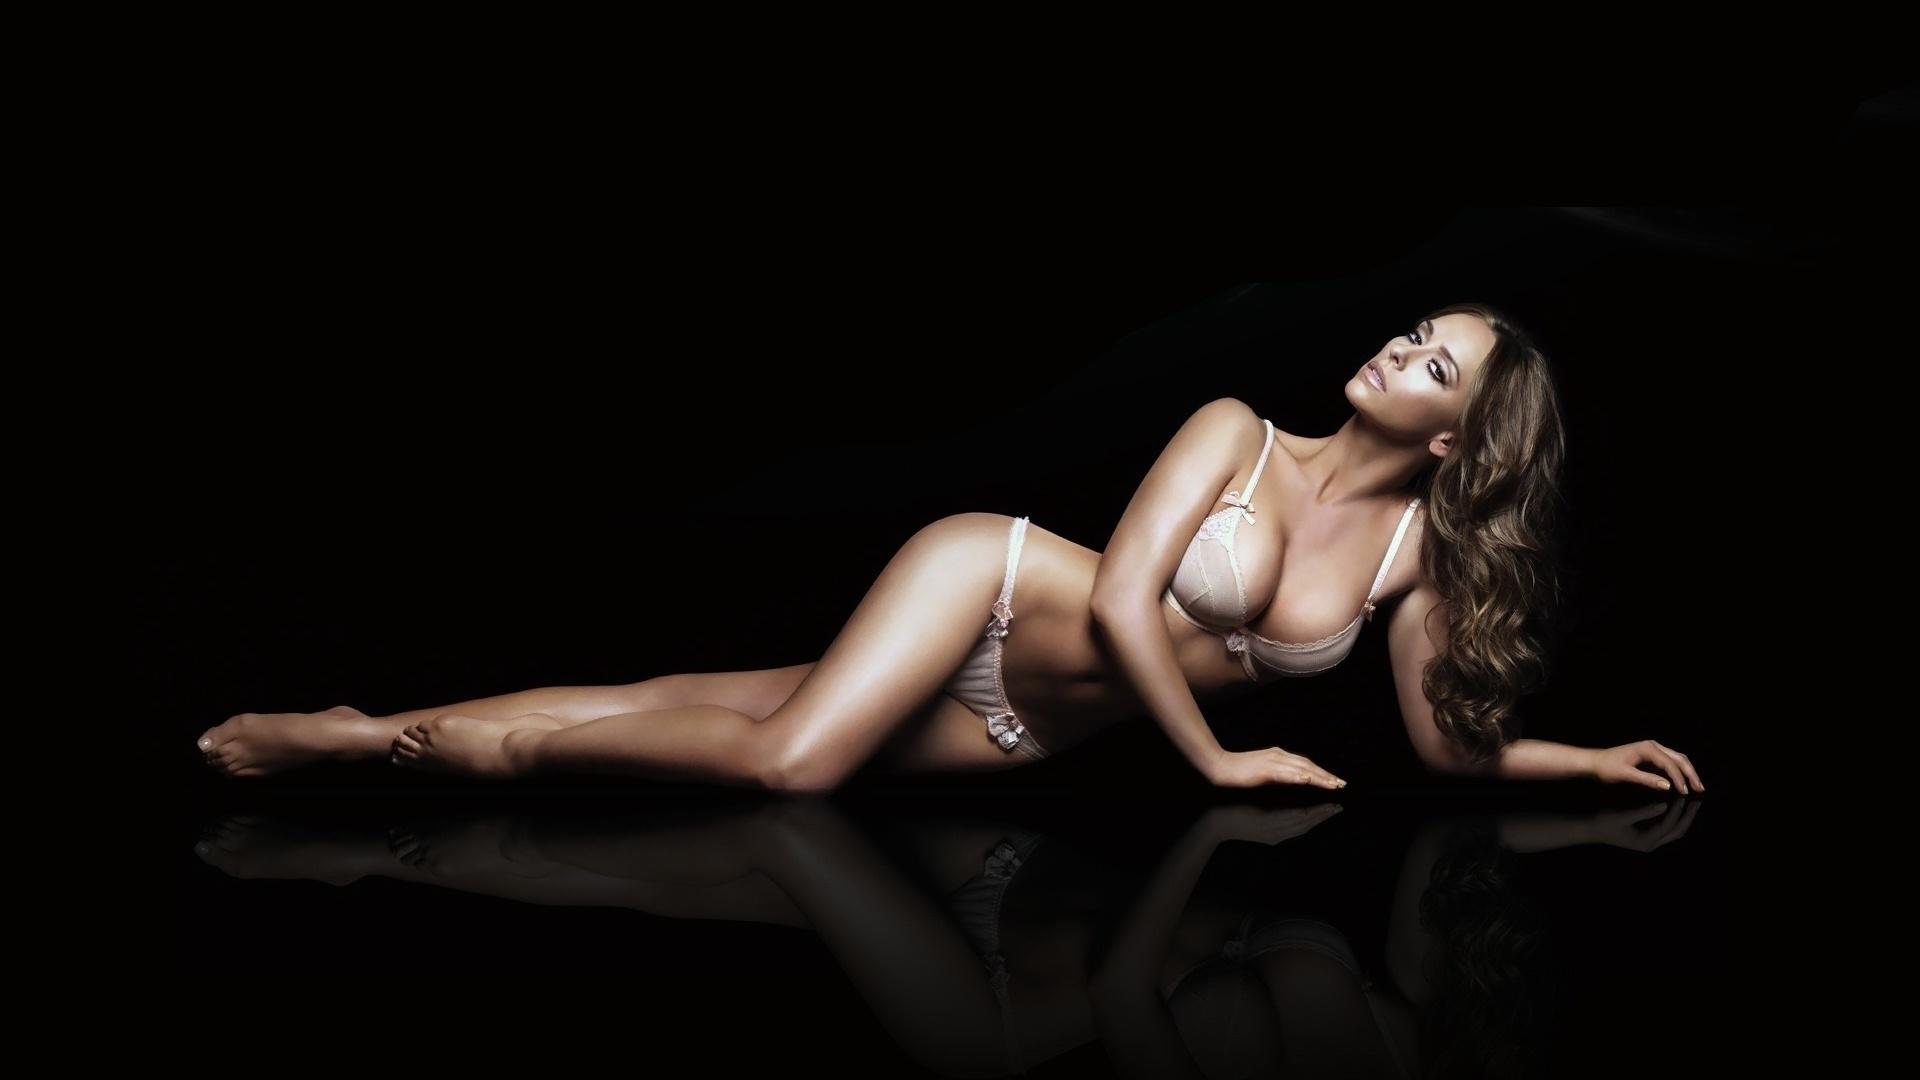 Фотообои голая грудь правы